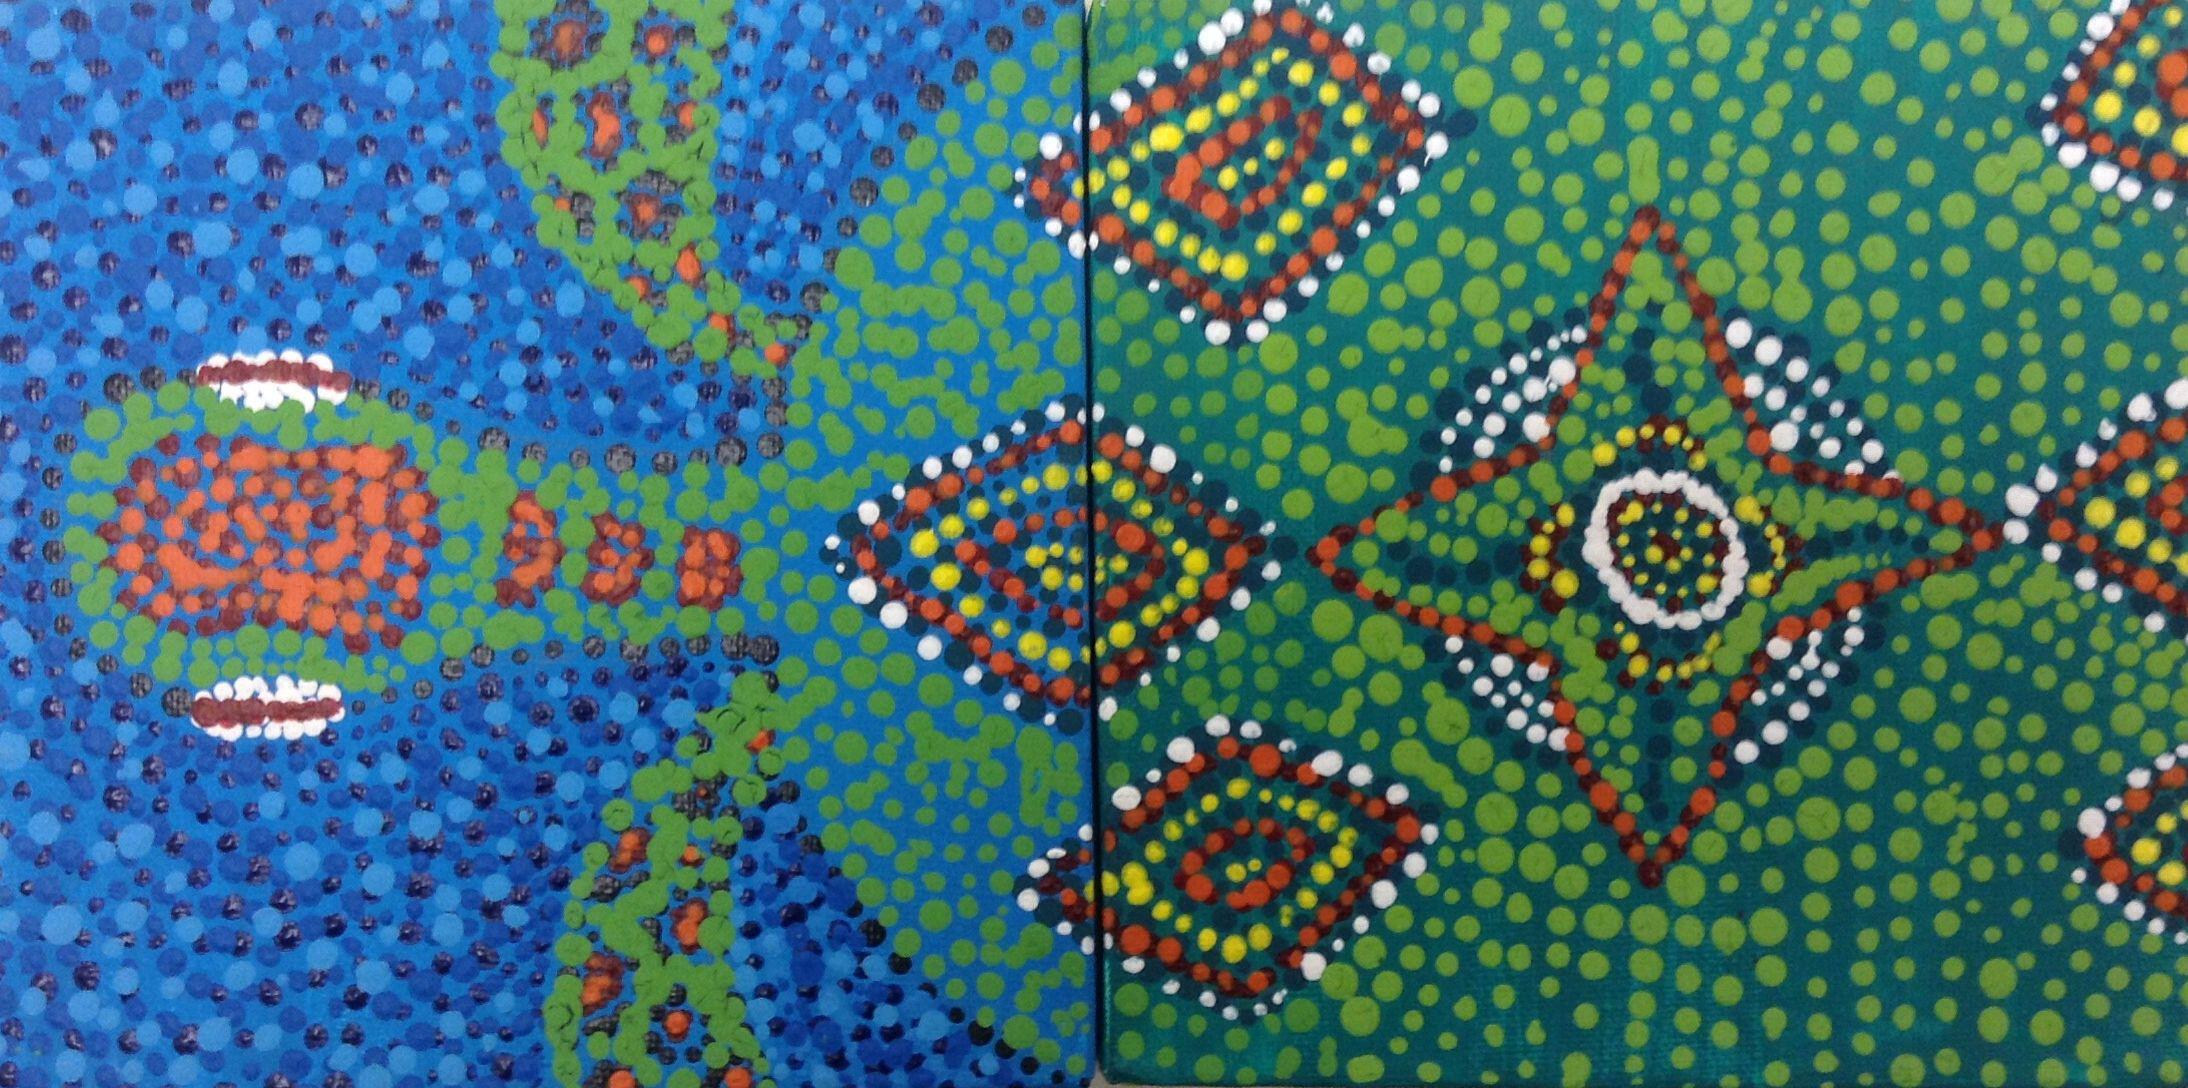 australian aboriginal dot art essay Globalisation and aboriginal art (particularly in dot paintings) australian aboriginal painting since 1960 at cologne's museum ludwig.